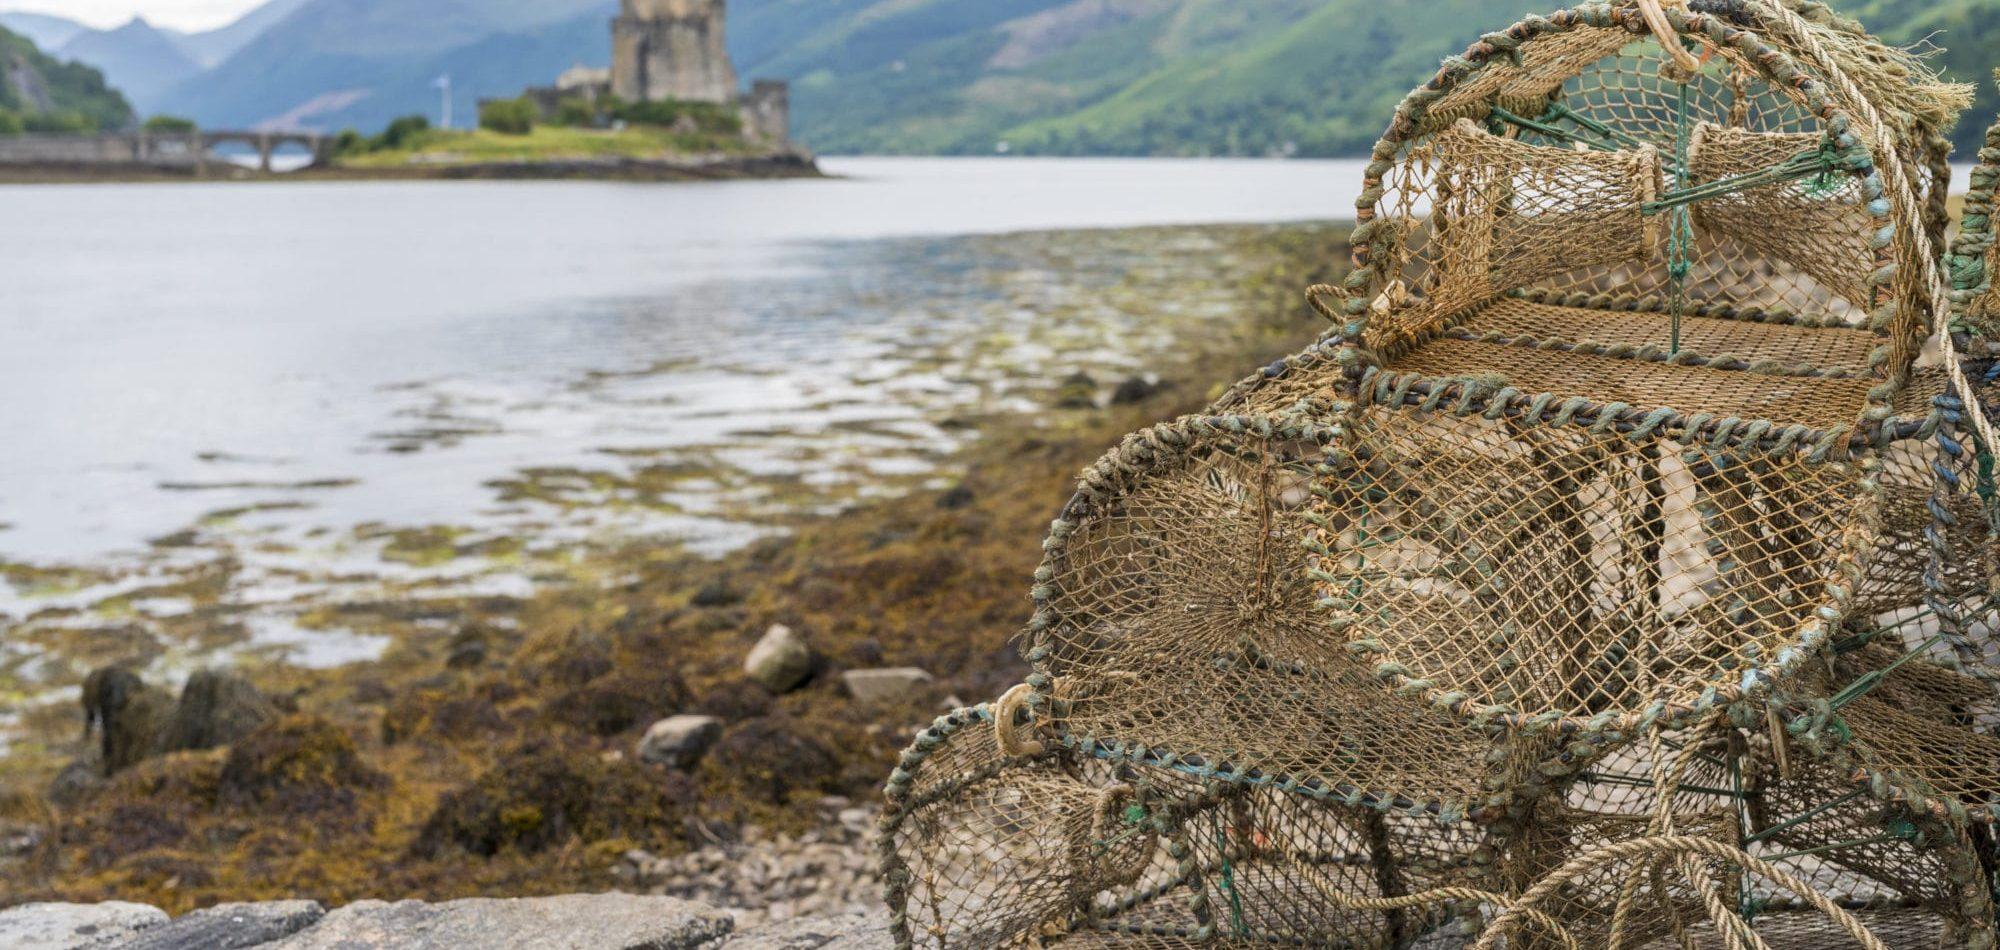 the-fishermen-of-eilean-donan-castle-sir-edwards-roadtrip